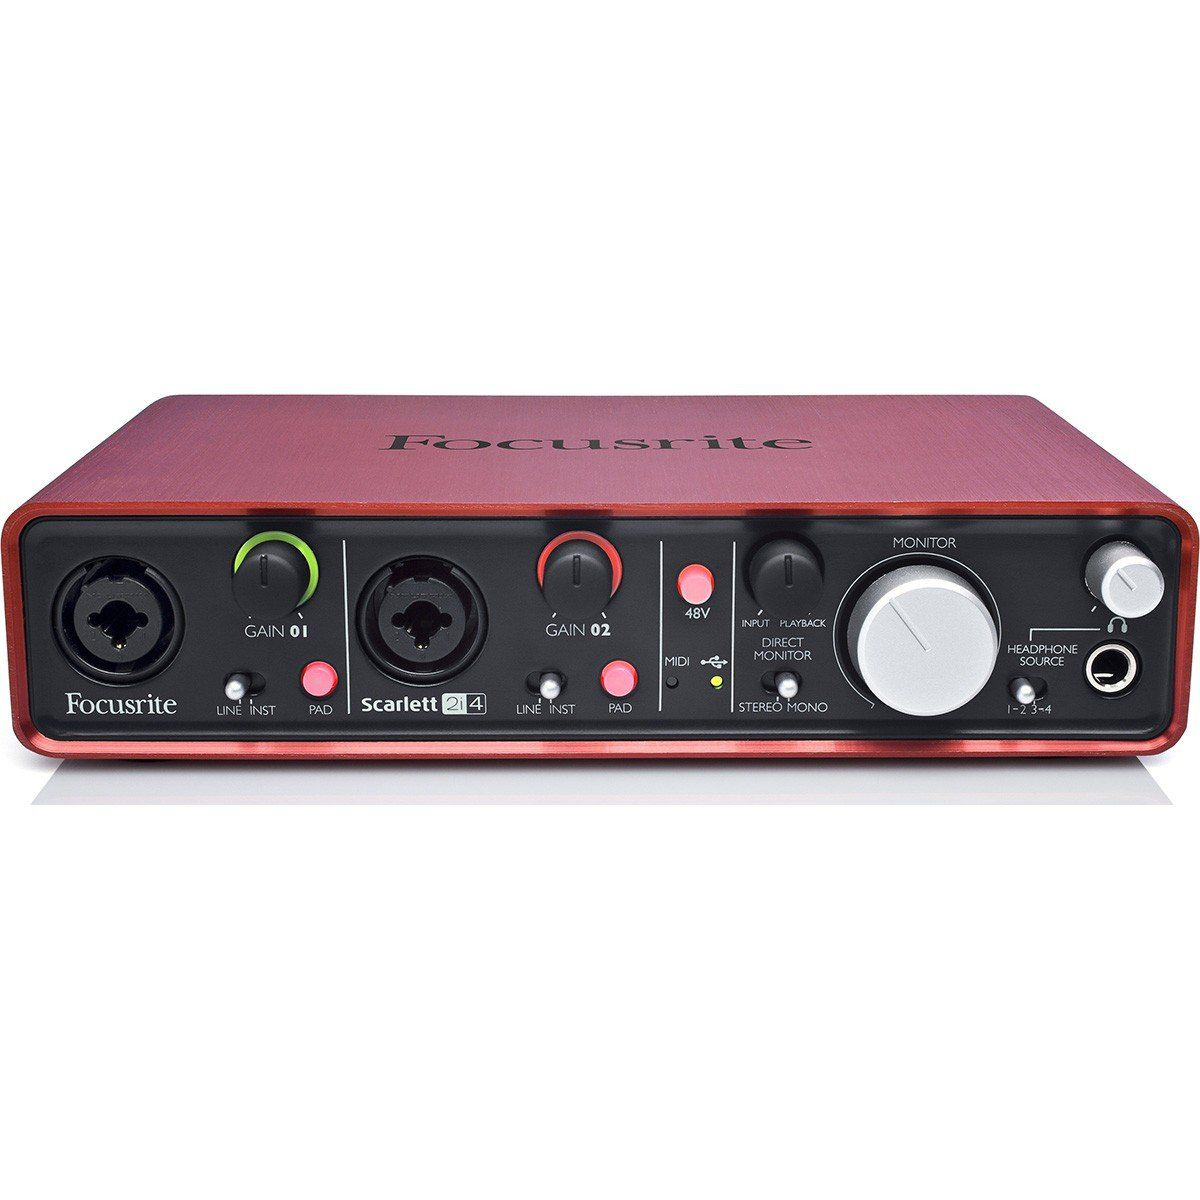 Focusrite Scarlett 2i4 Interface de Audio Scarlett 2 i 4 Usb 2x4 Mac Windows 192-Khz